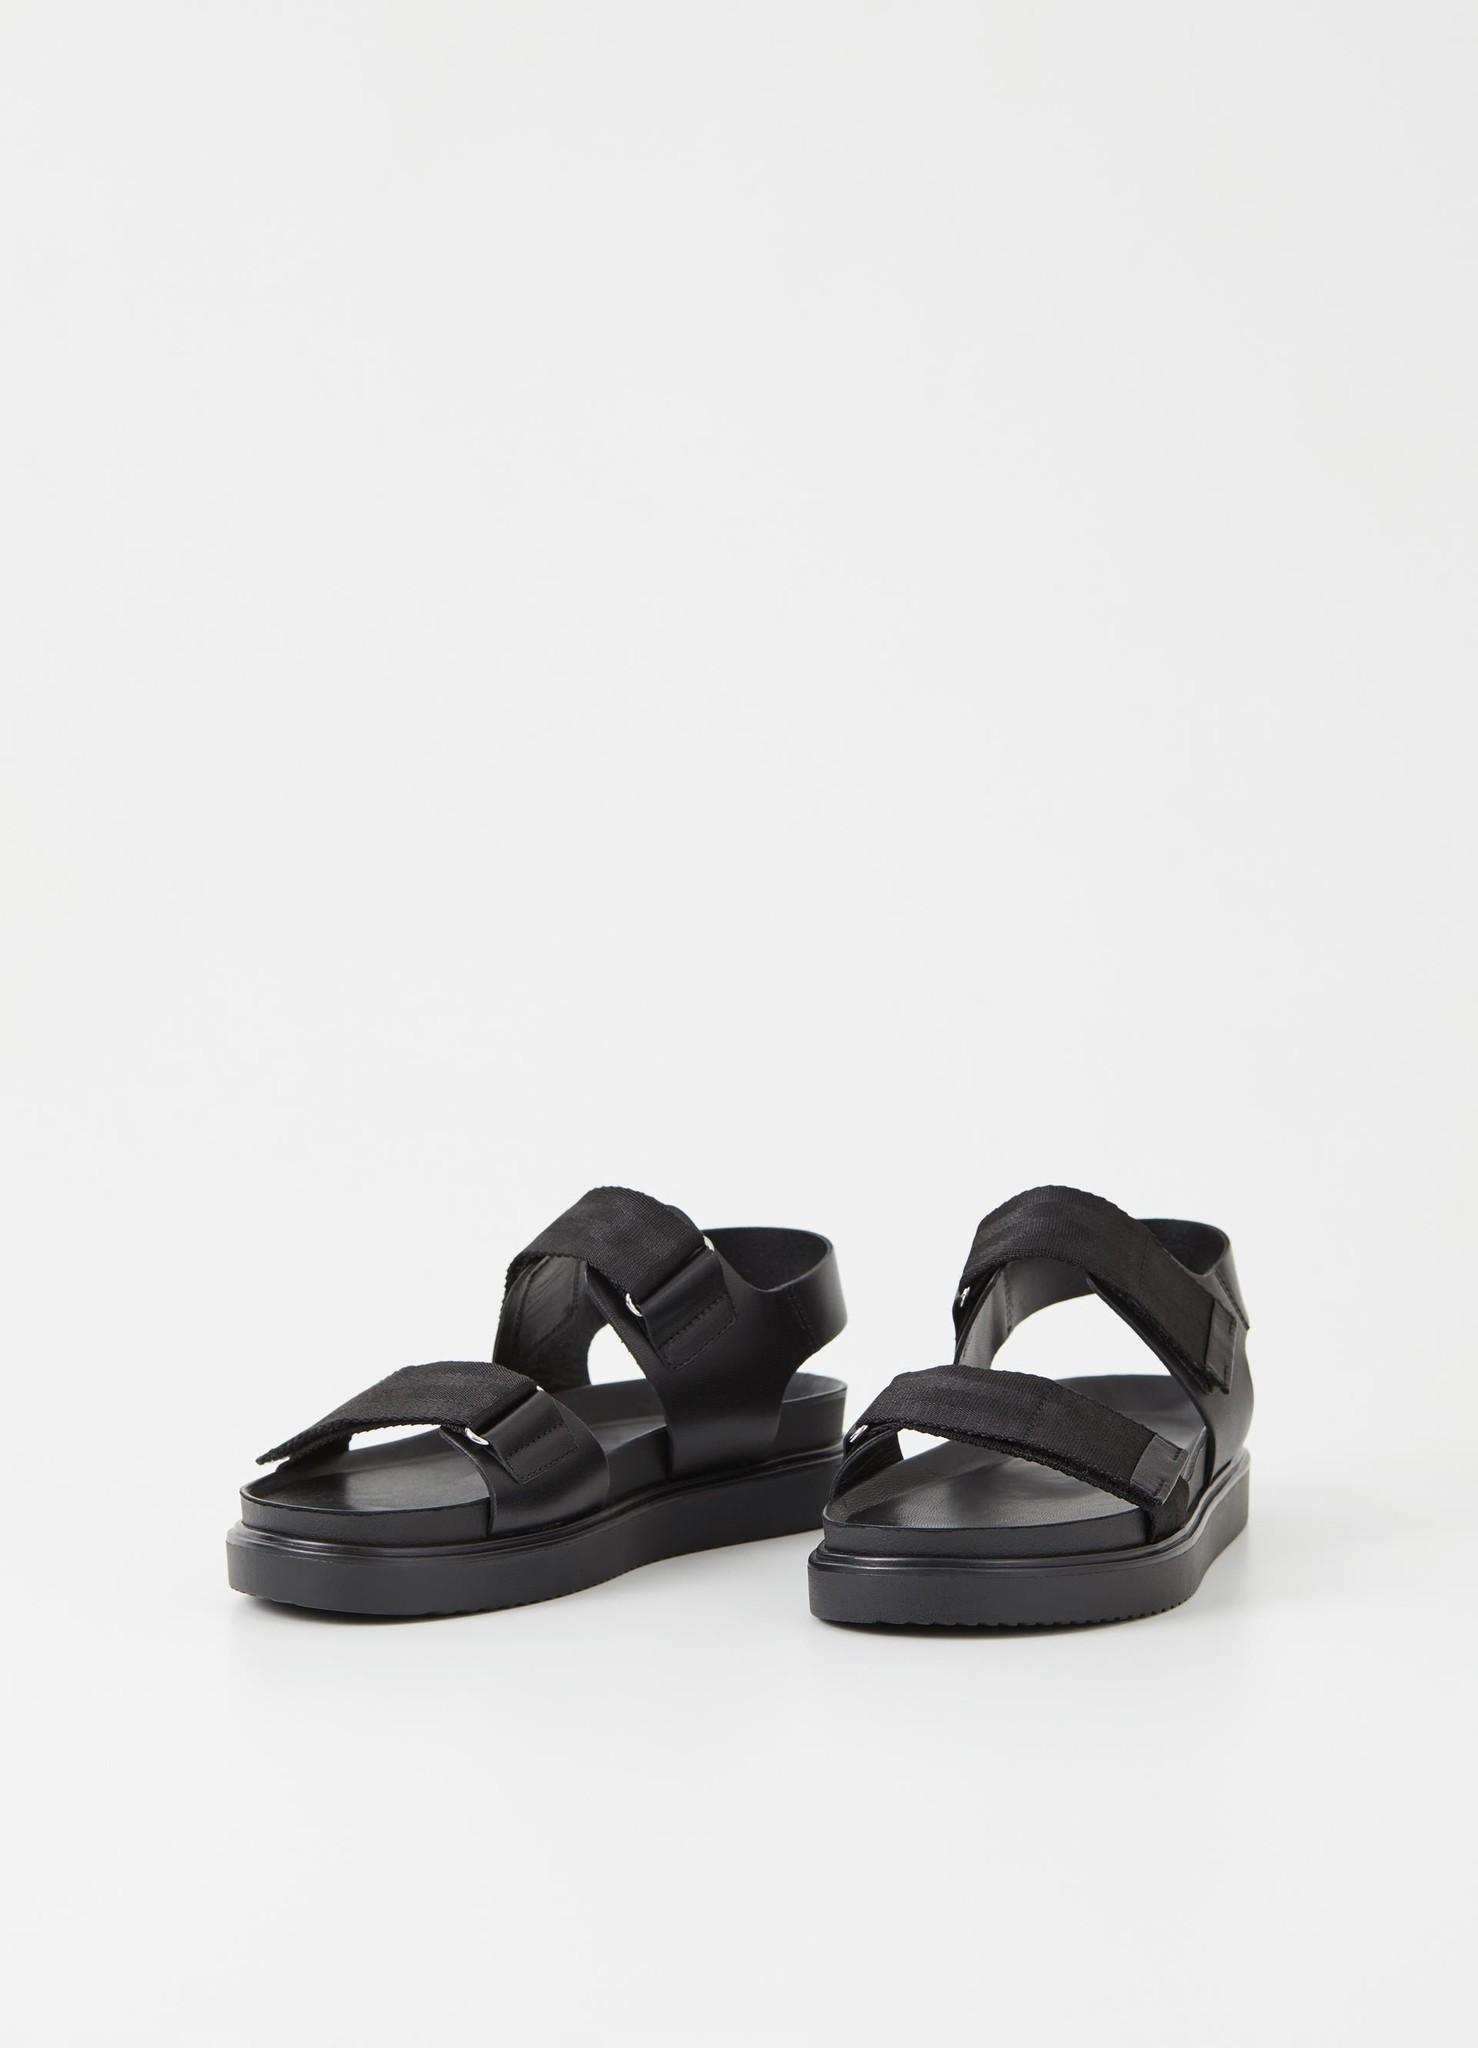 Seth Black Leather Sandals-1